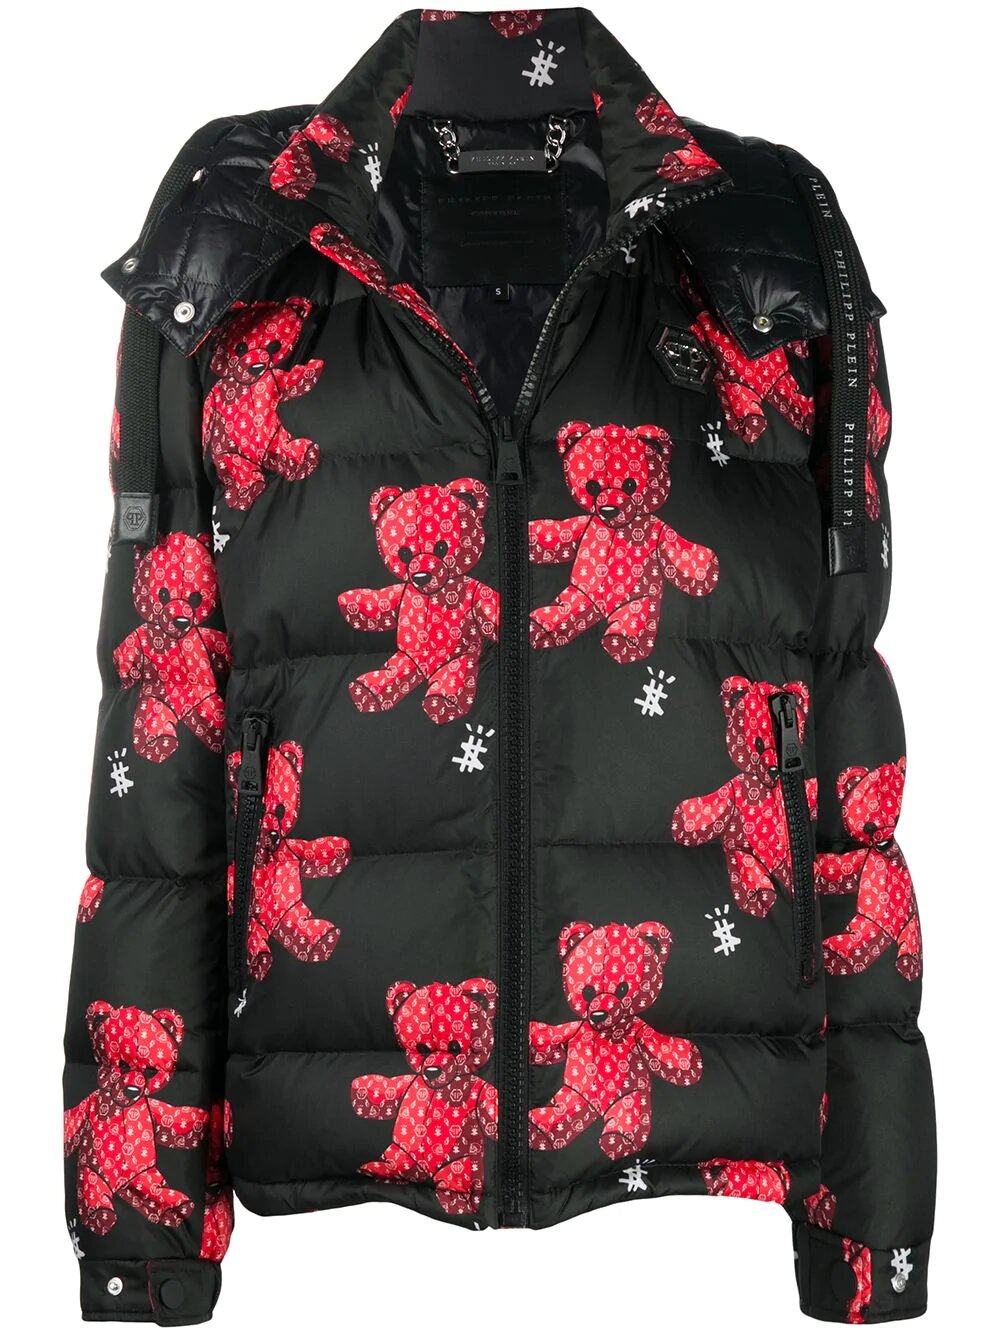 Philipp Plein, Тeddy bear print puffer jacket 4802лв, 2446лв